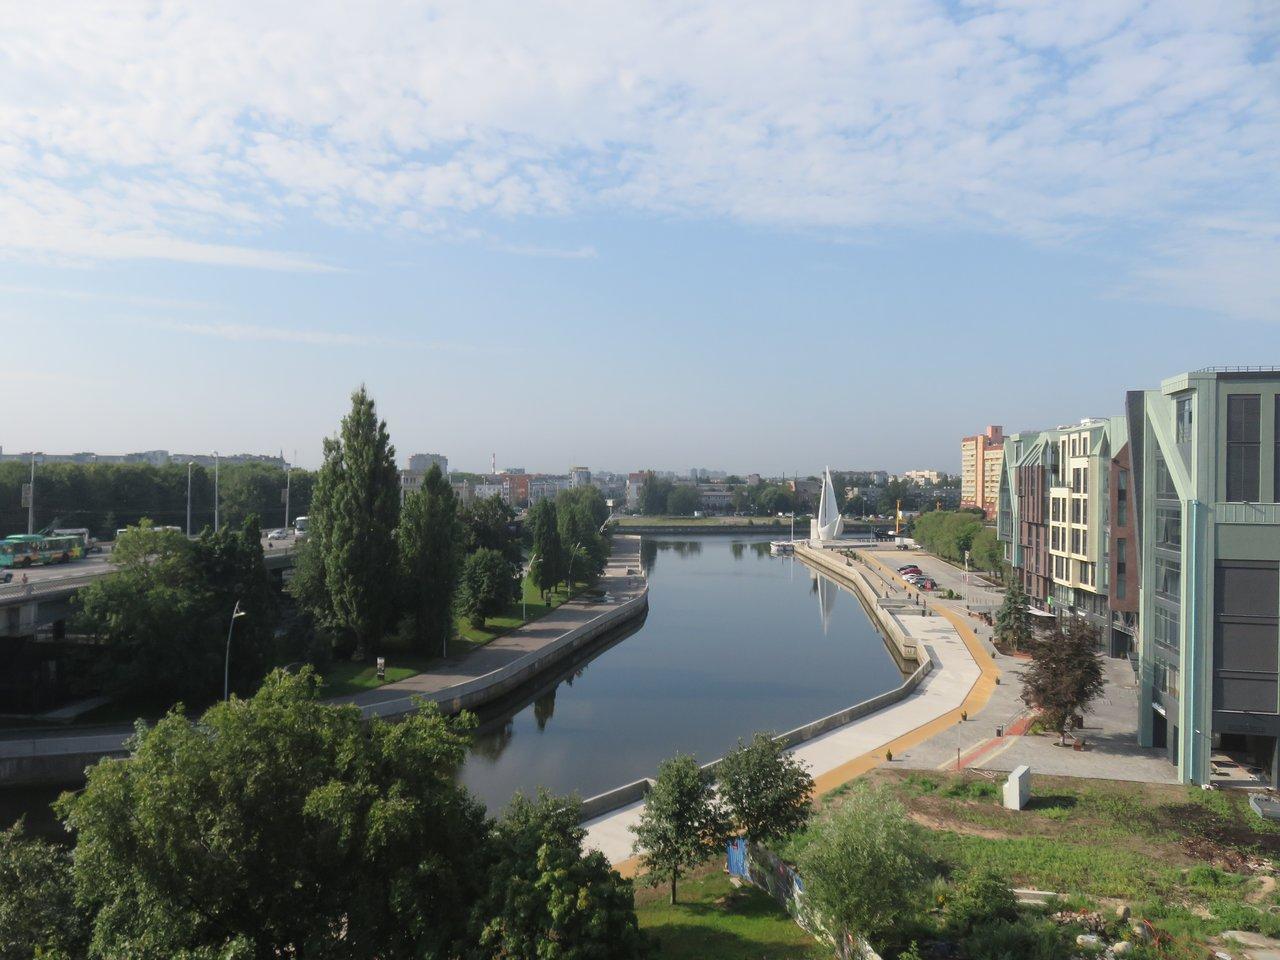 The best resorts of the Kaliningrad region: list, description, prices